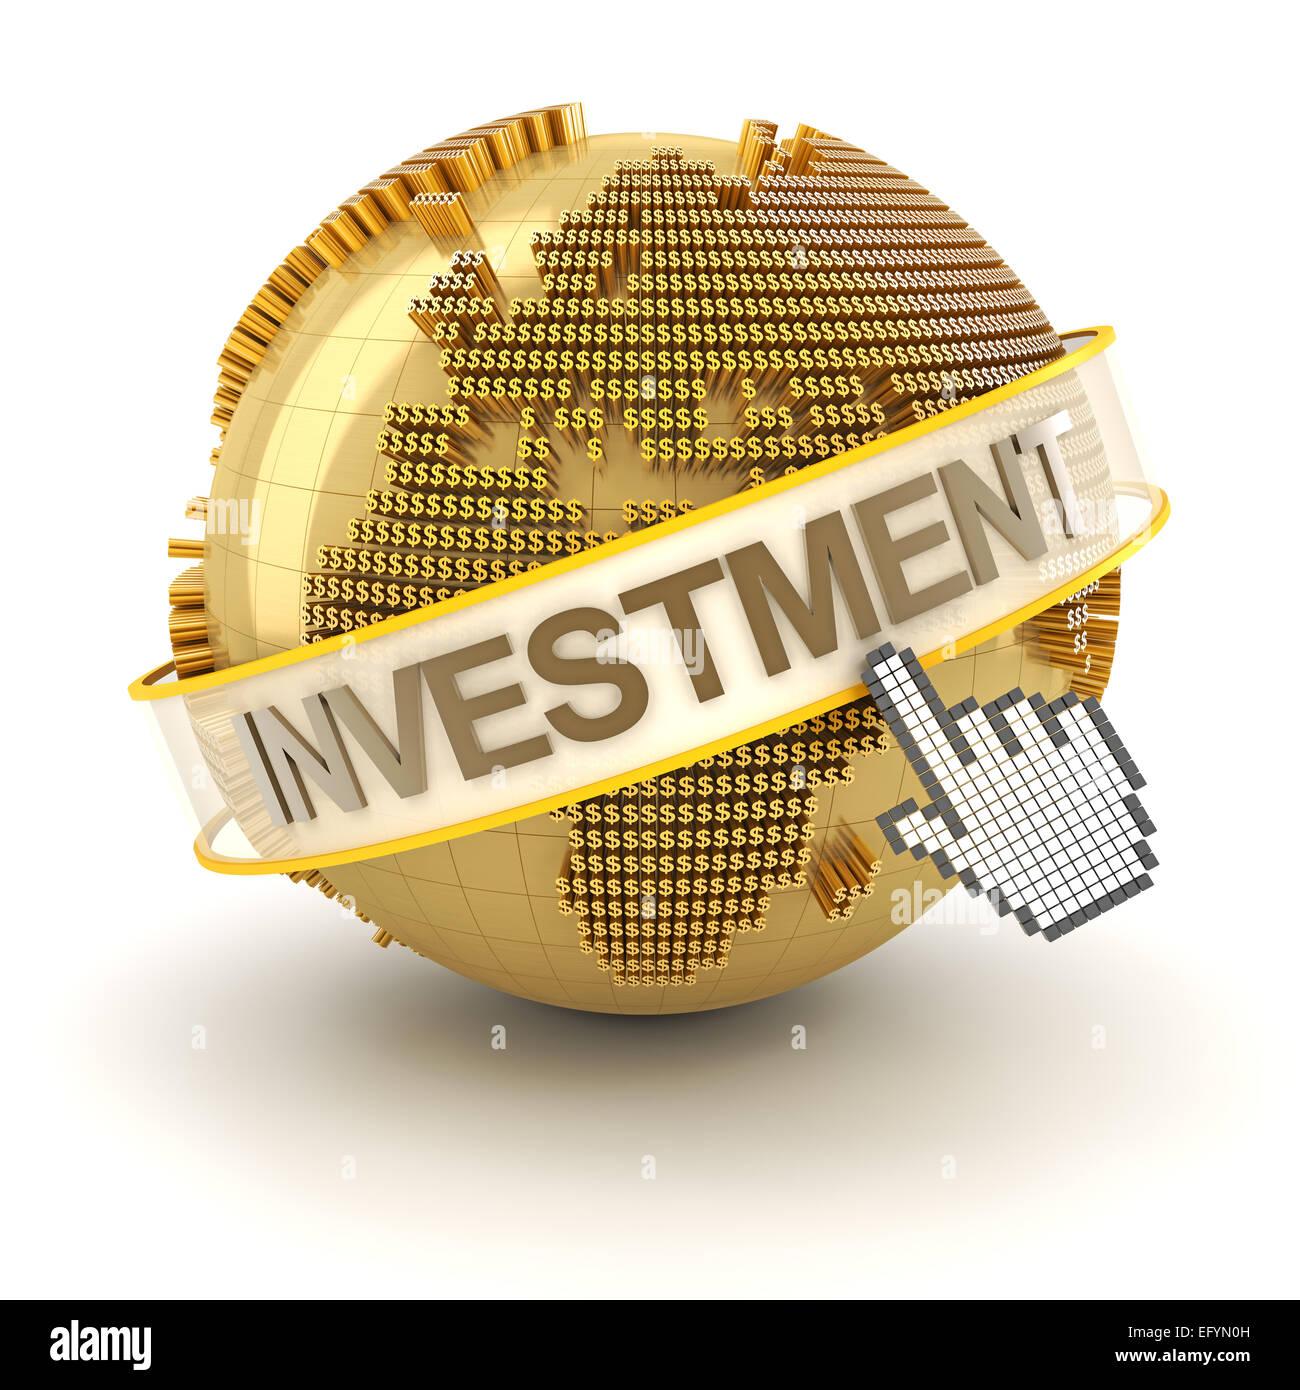 Global investment concept, Europe region, 3d render - Stock Image